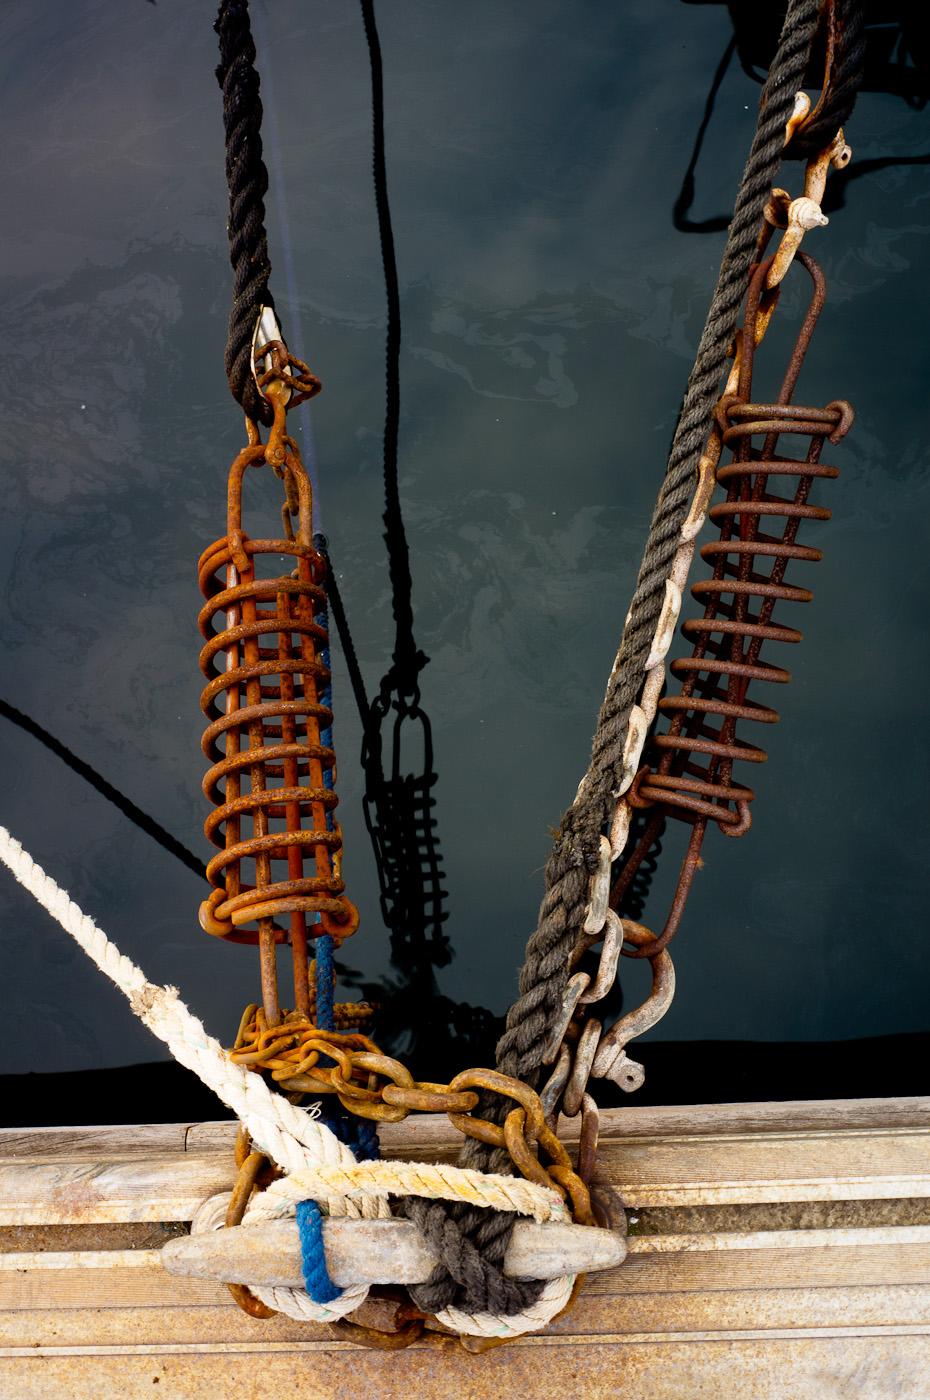 Ropes holding tight to sail boat in La Ciotat